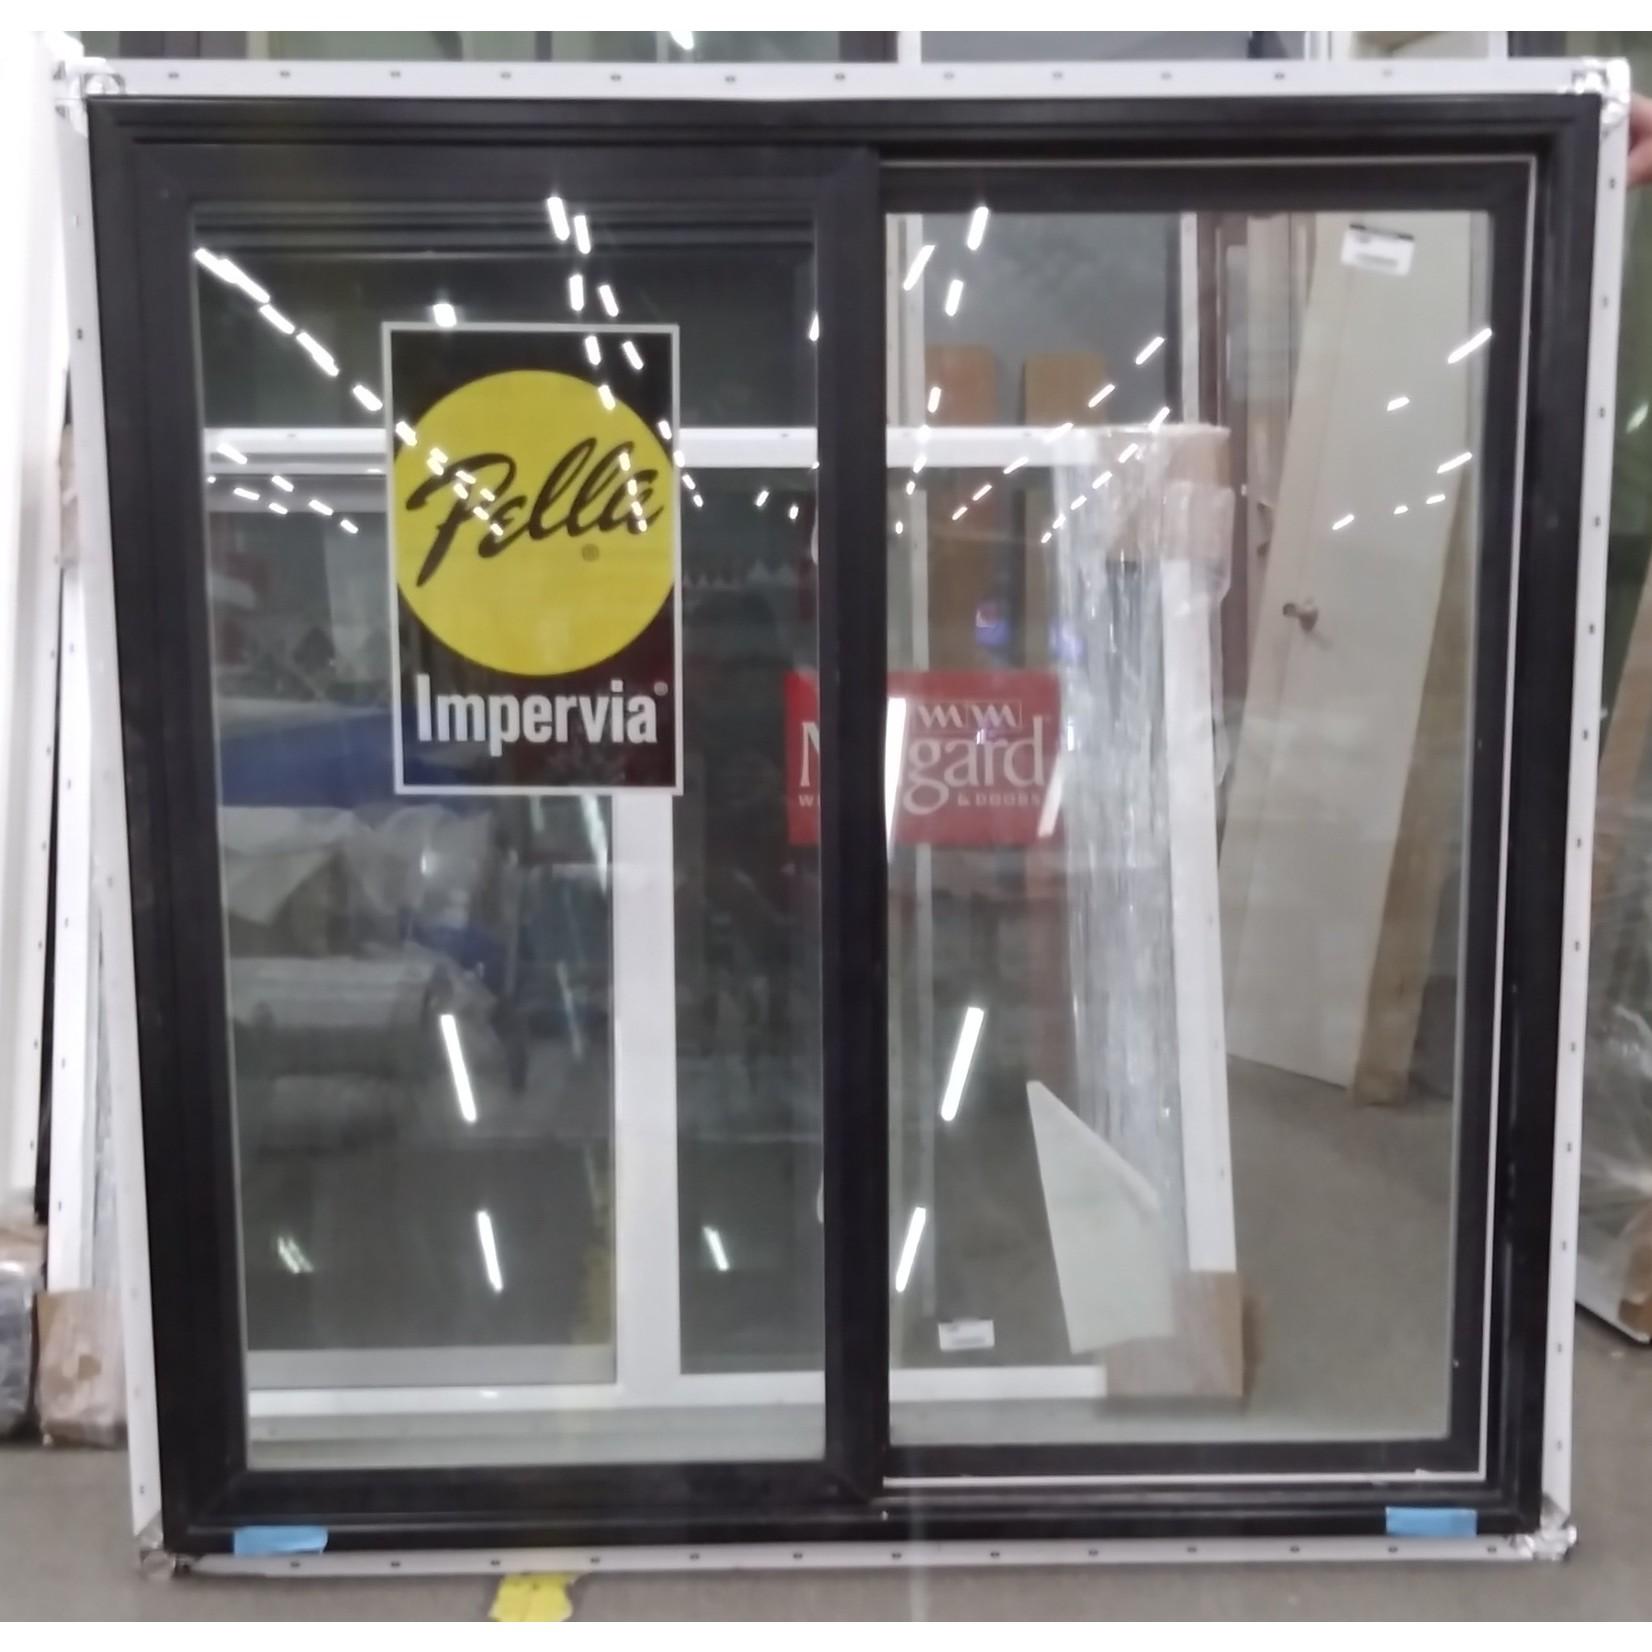 10210 Pella Impervia 2 Pane Sliding Window